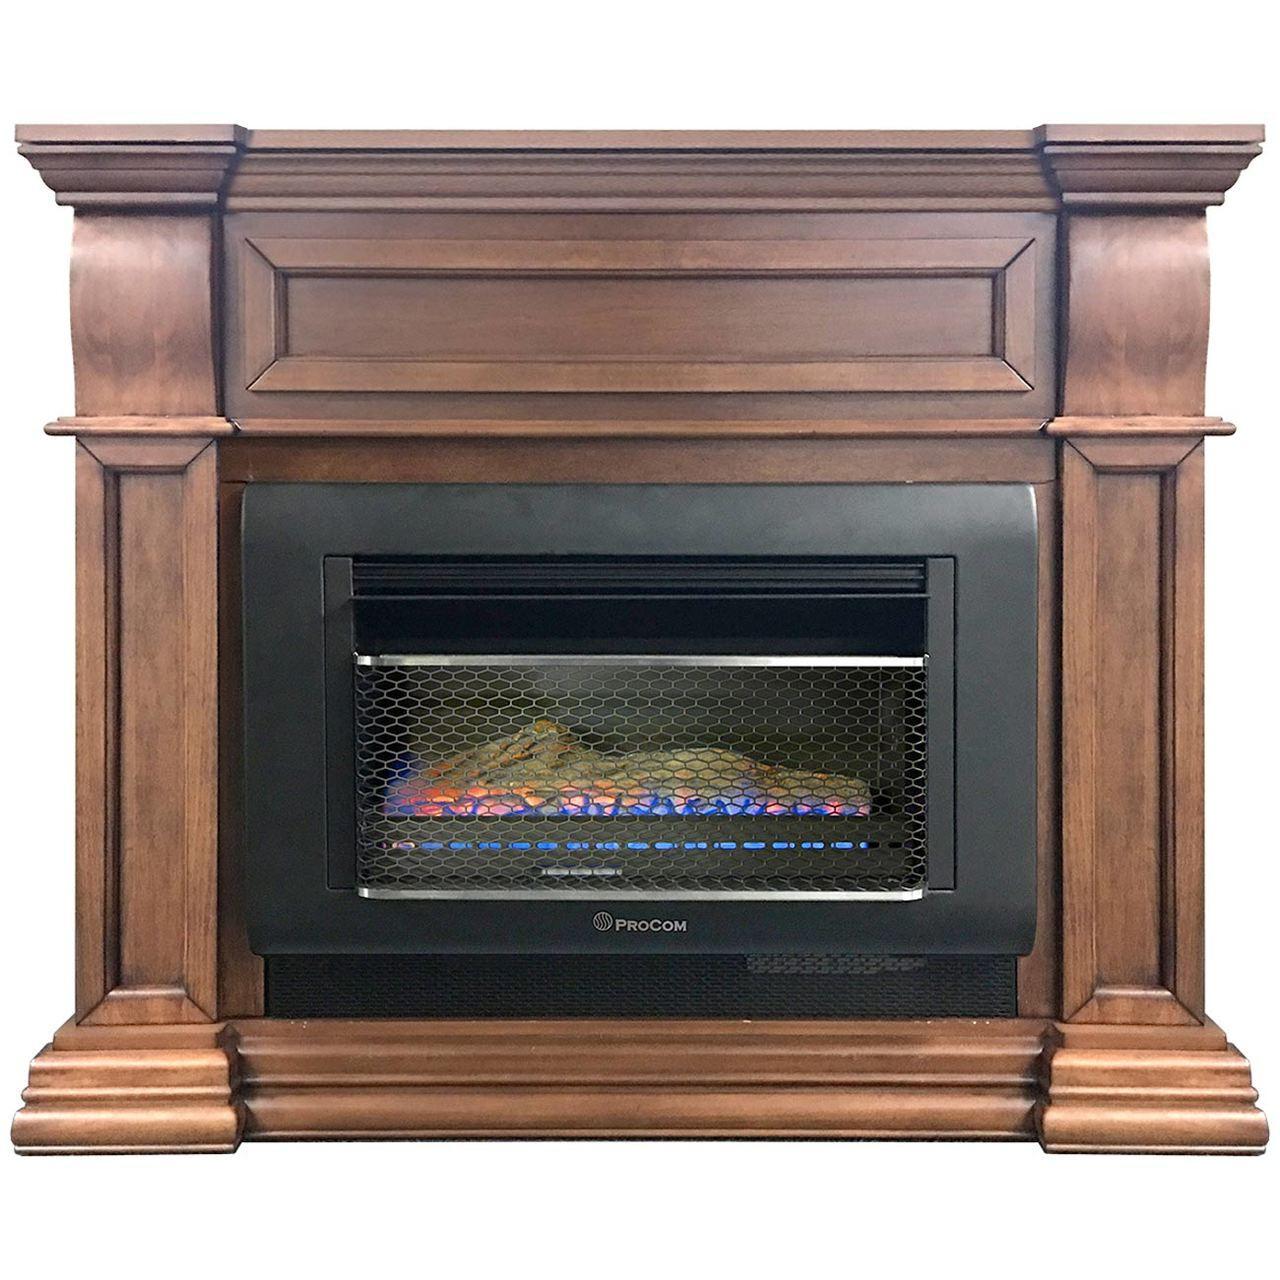 gas wall fireplace outdoor procom mini hearth ventless gas wall fireplace 26000 btu tstat control